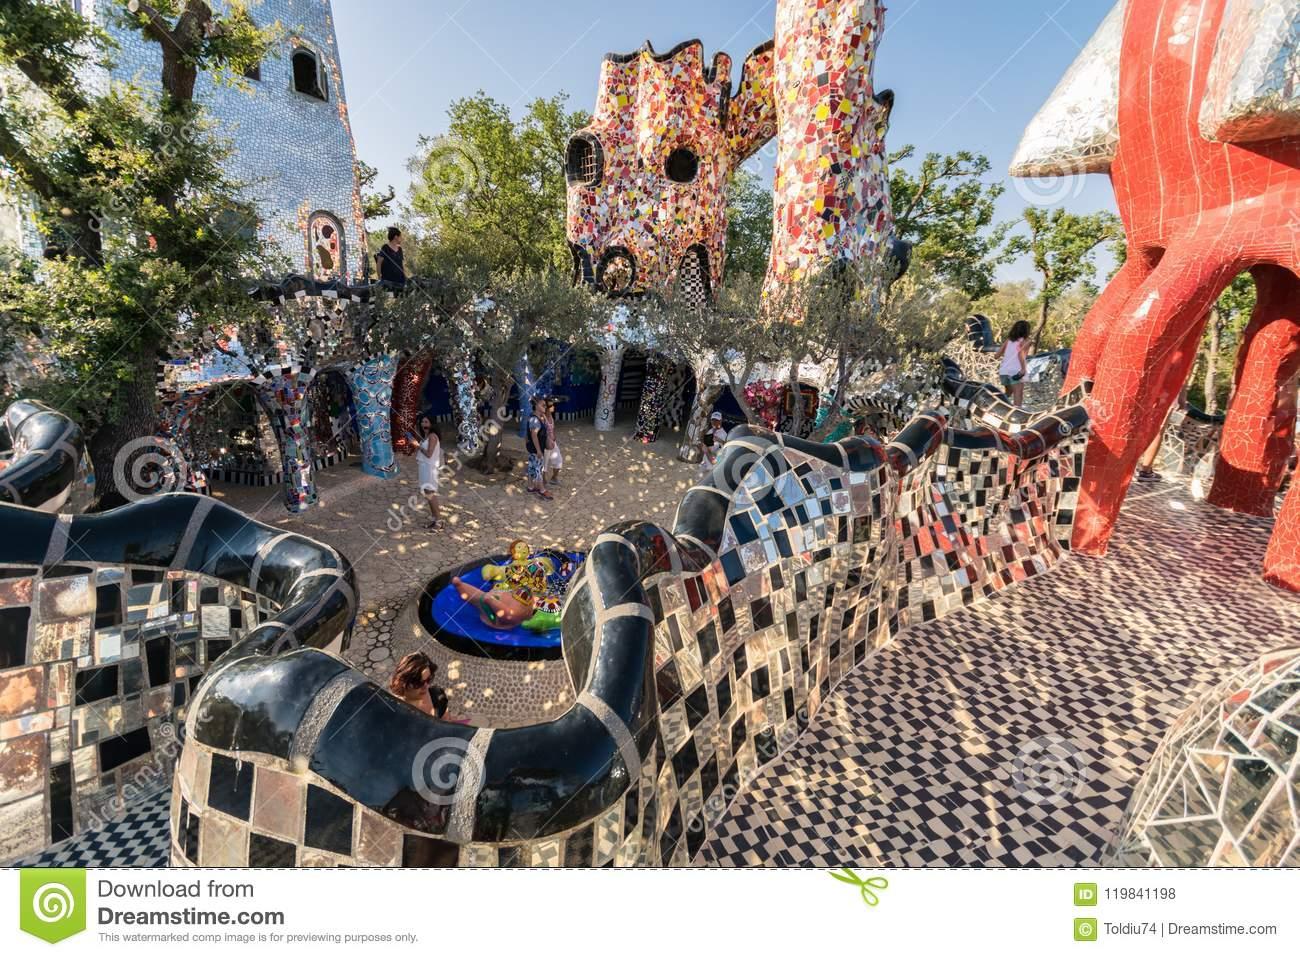 tarot garden sculpture based esoteric tar pescia fiorentina italy june created french artist niki de saint phalle